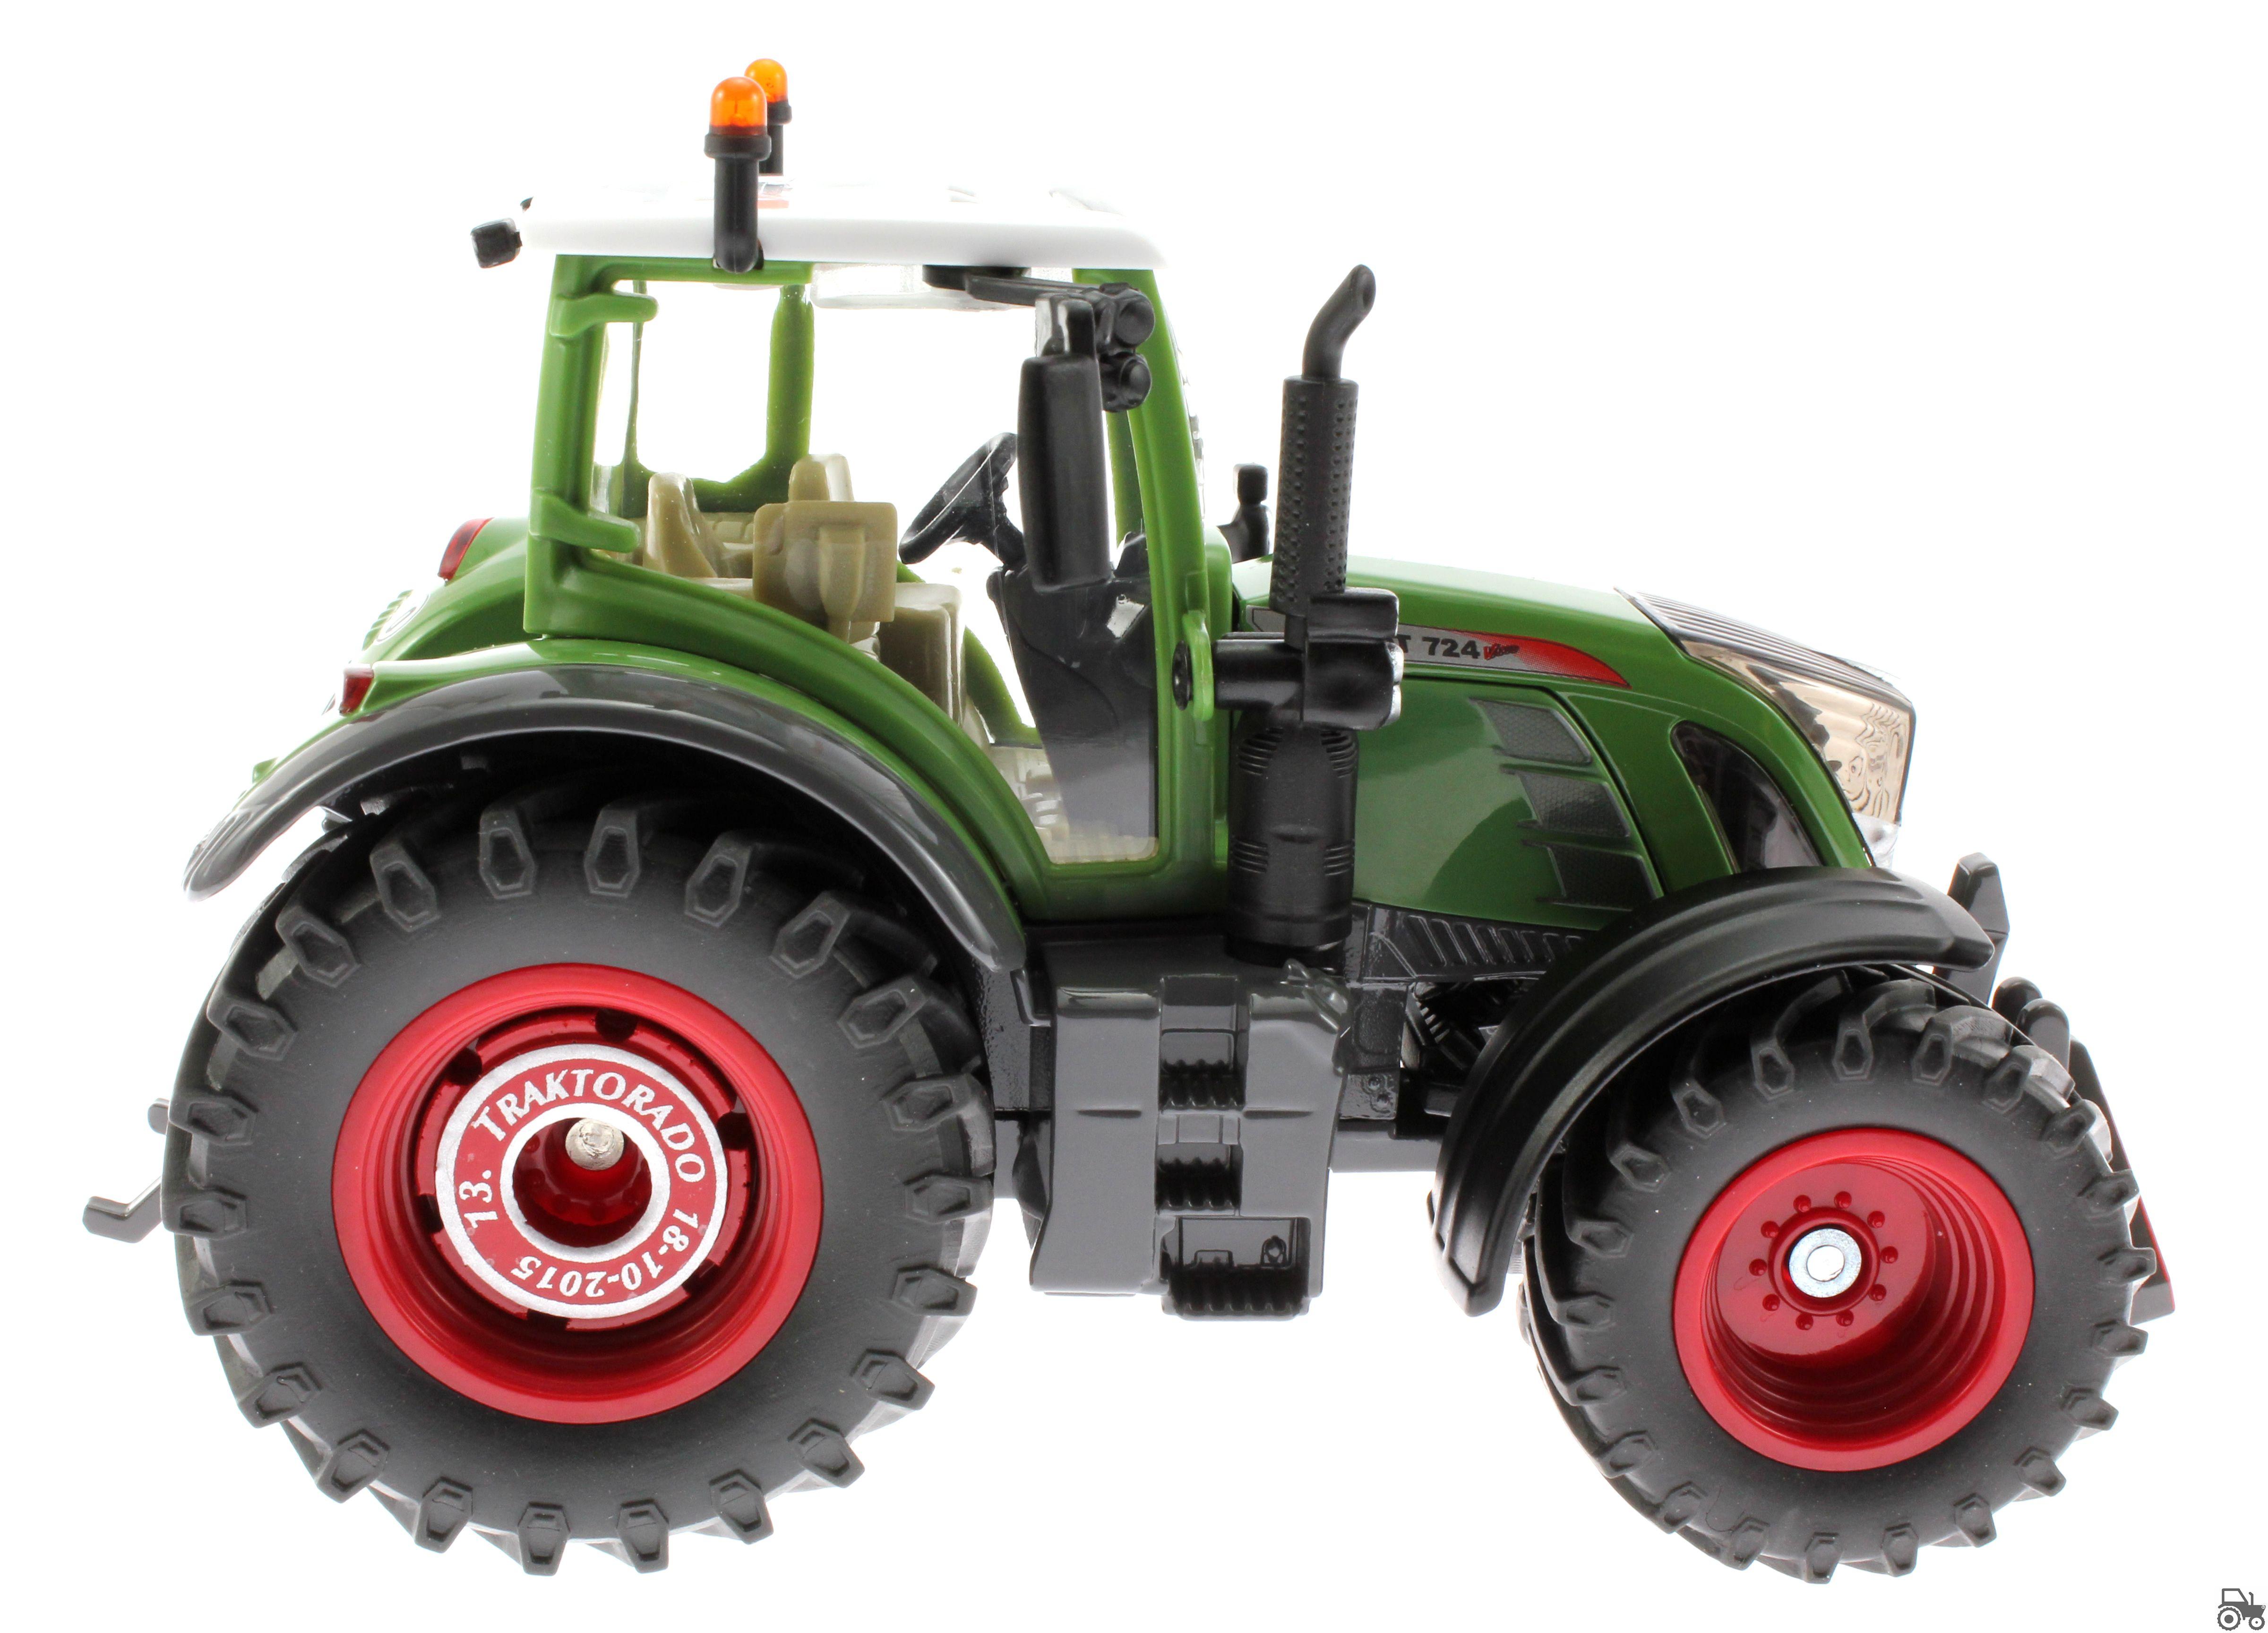 Siku 3285 Traktorado 2015 - Fendt 724 Vario